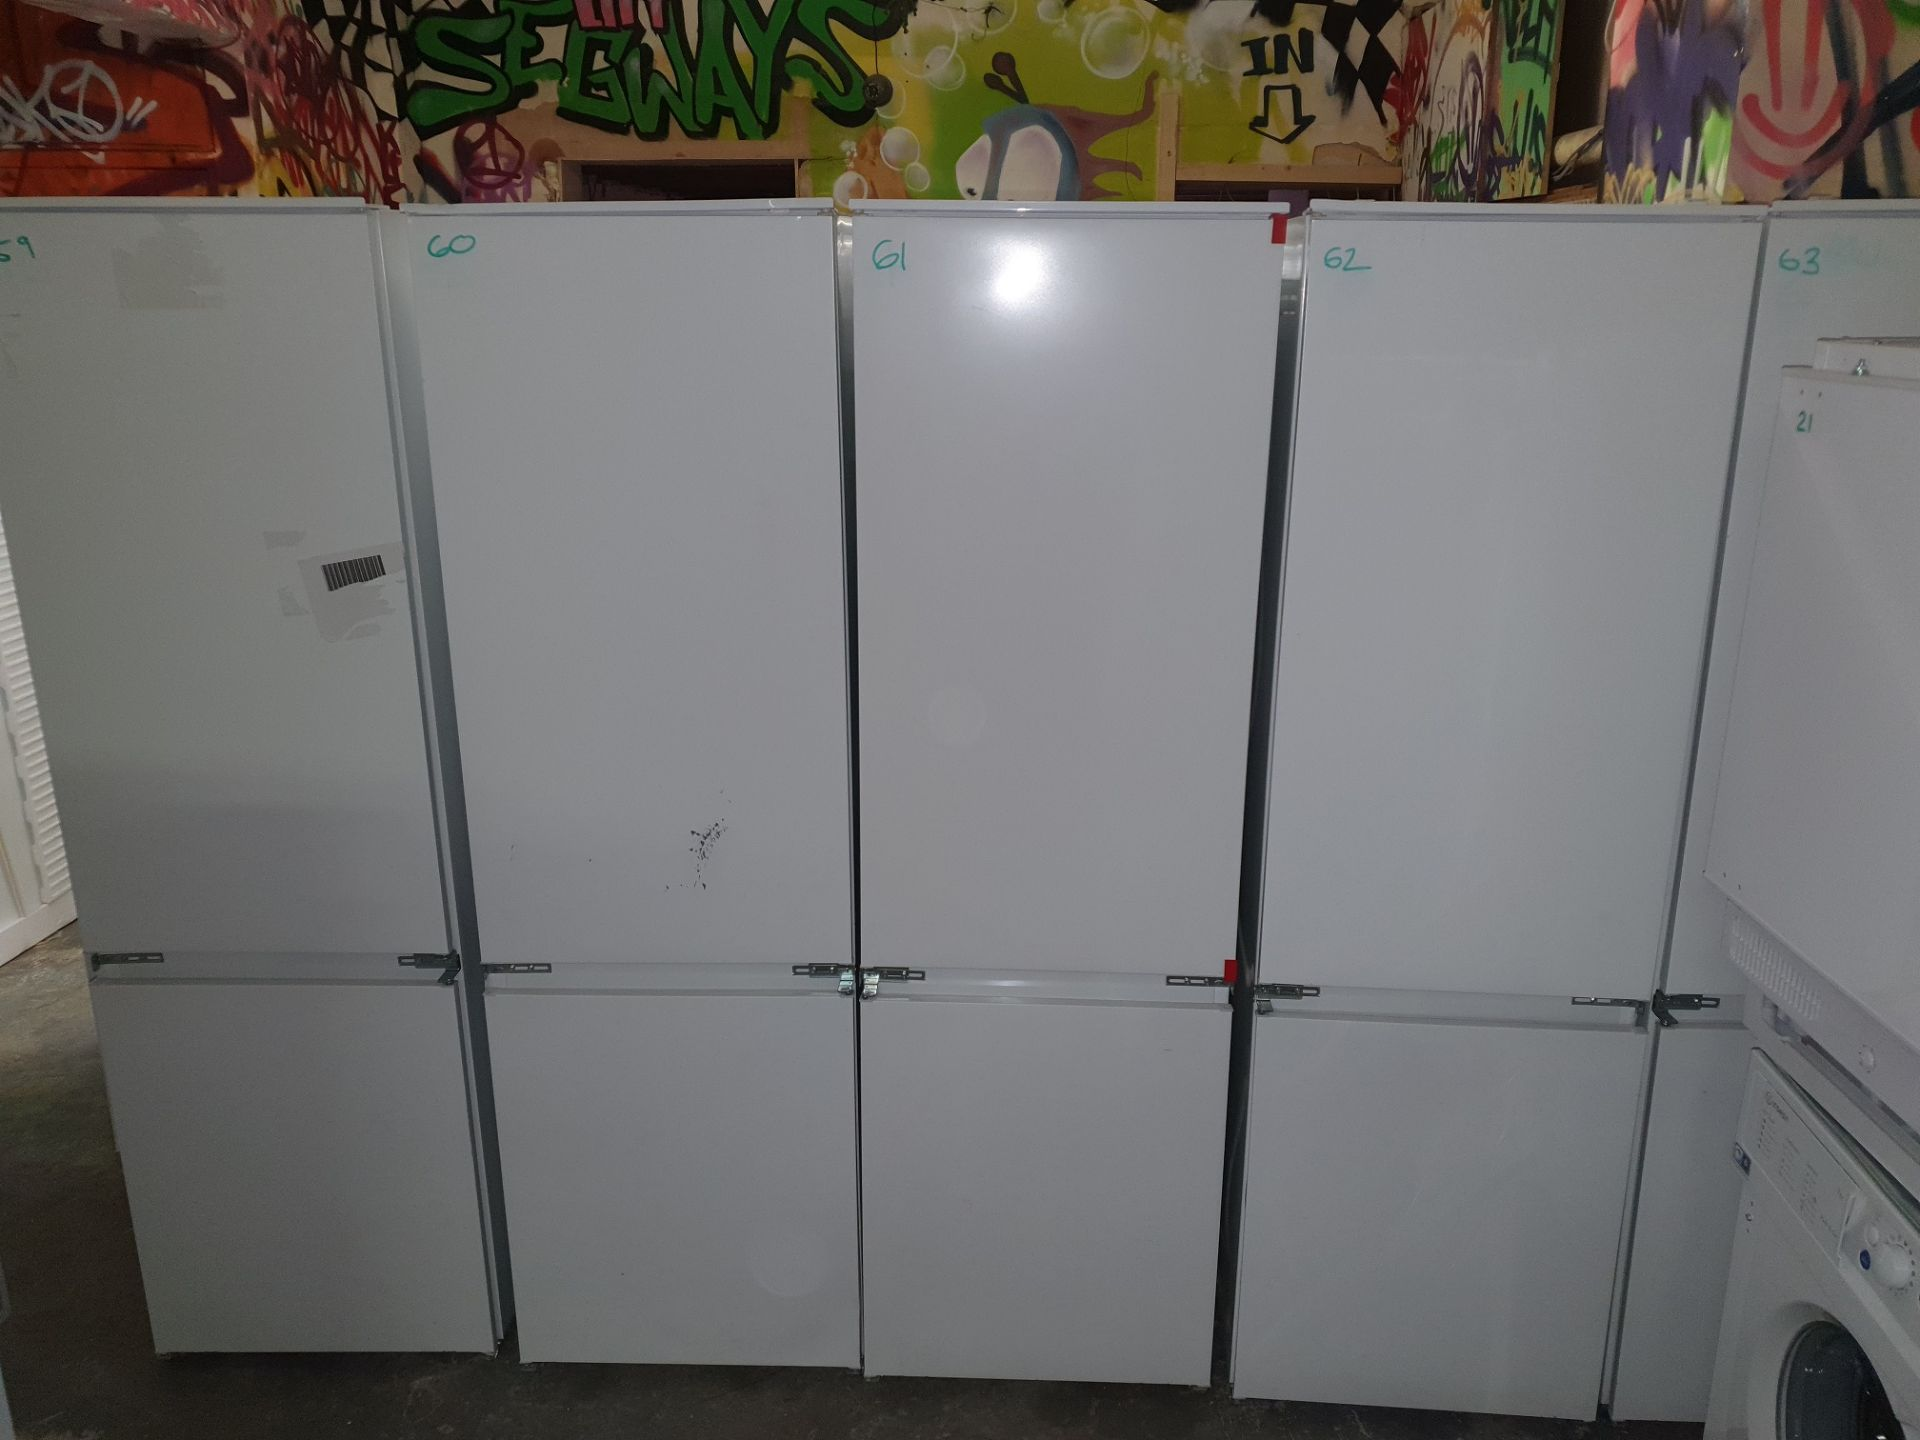 NEW/GRADED AND UNPACKAGED Zanussi ZBB28441SV Integrated 70/30 Fridge Freezer (Brand new slight - Image 12 of 14